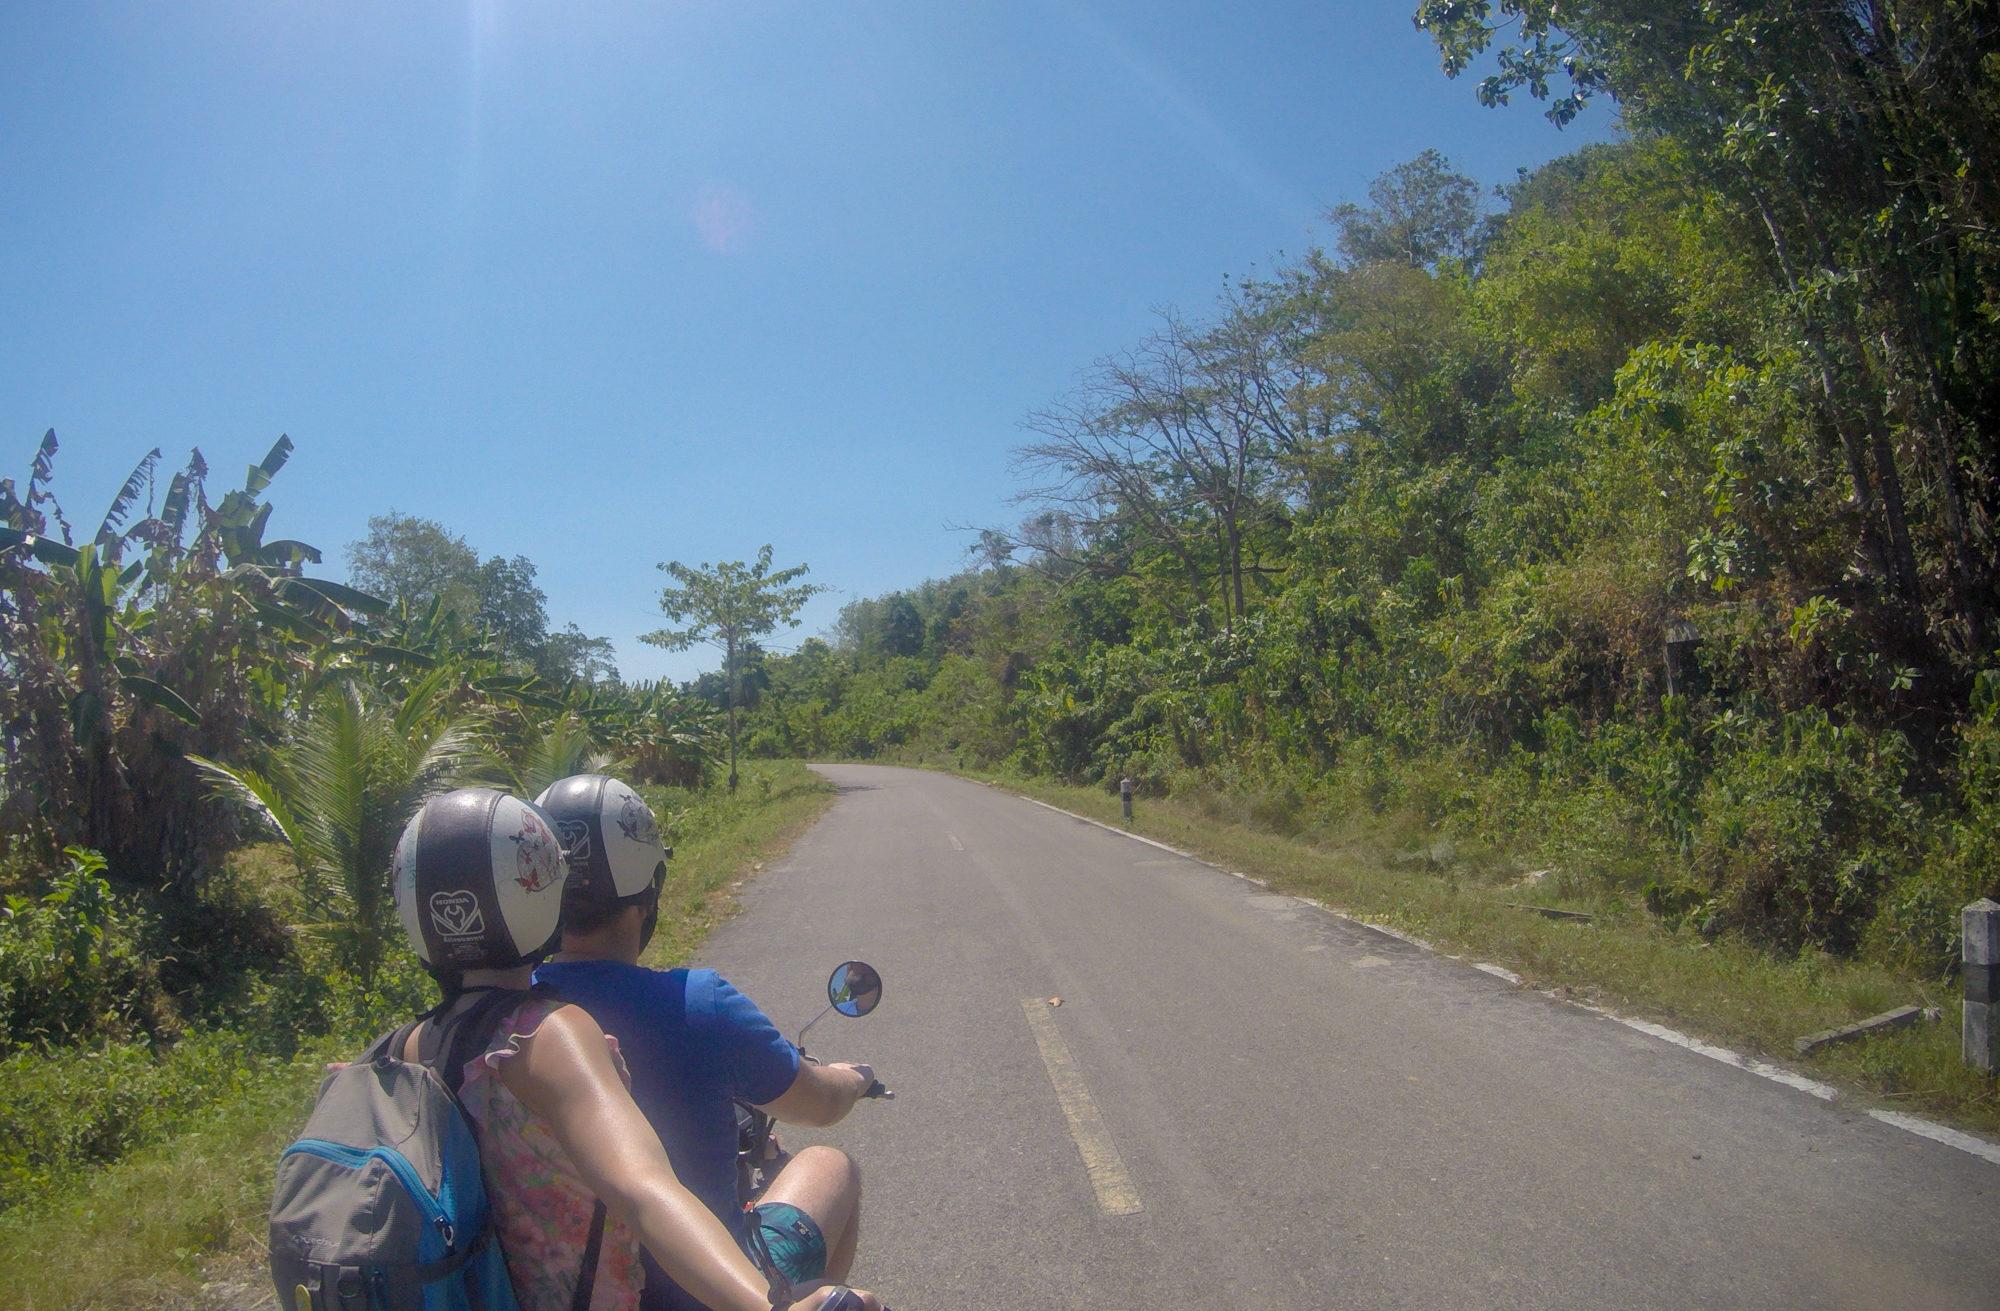 thailand koh lanta scooter